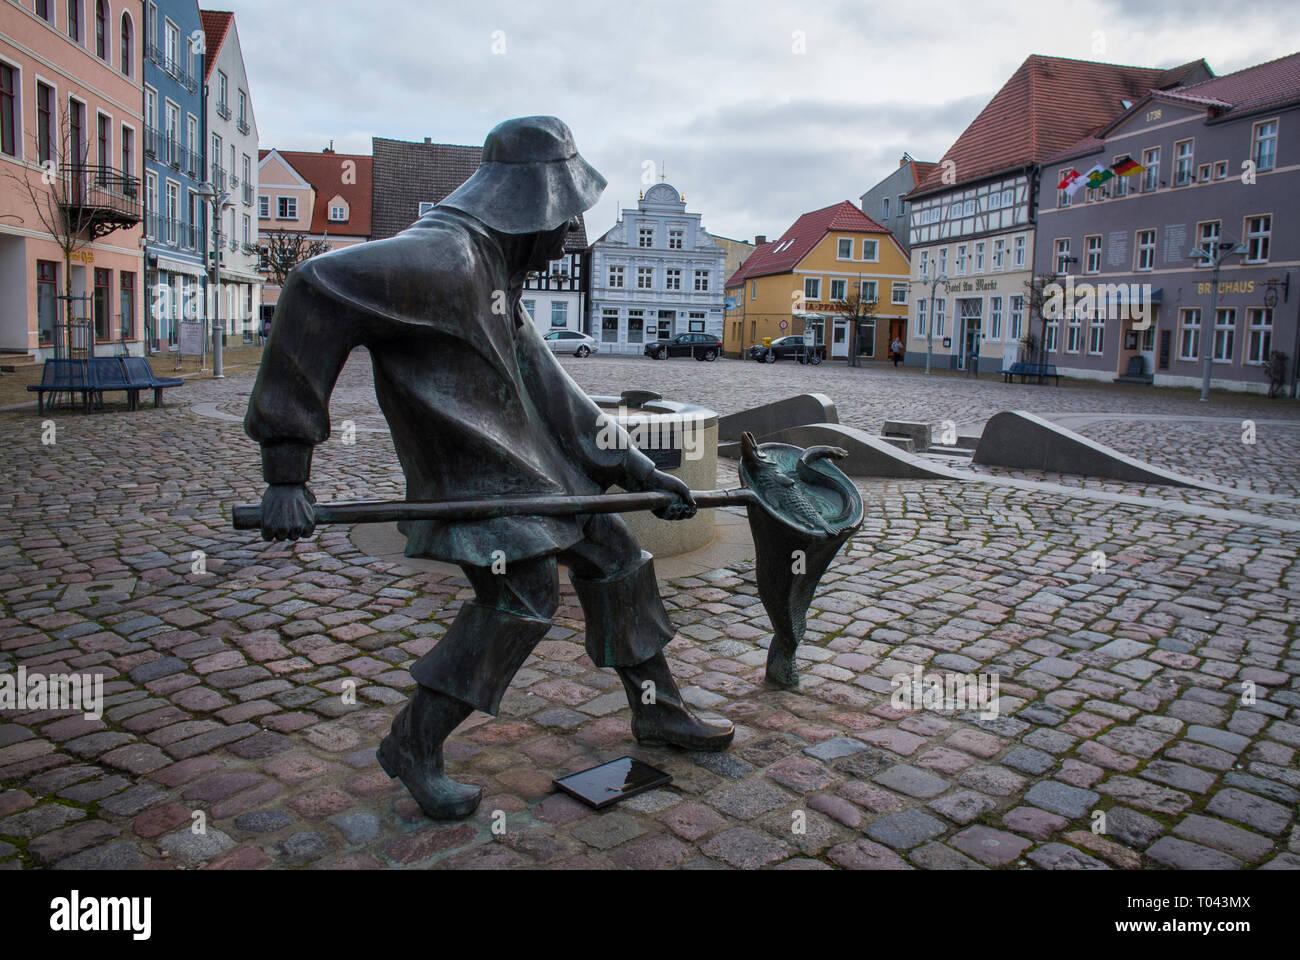 The Market Square in Ueckermünde,Vorpommern-Greifswald, Western Pomerania, near Germany's border with Poland. - Stock Image